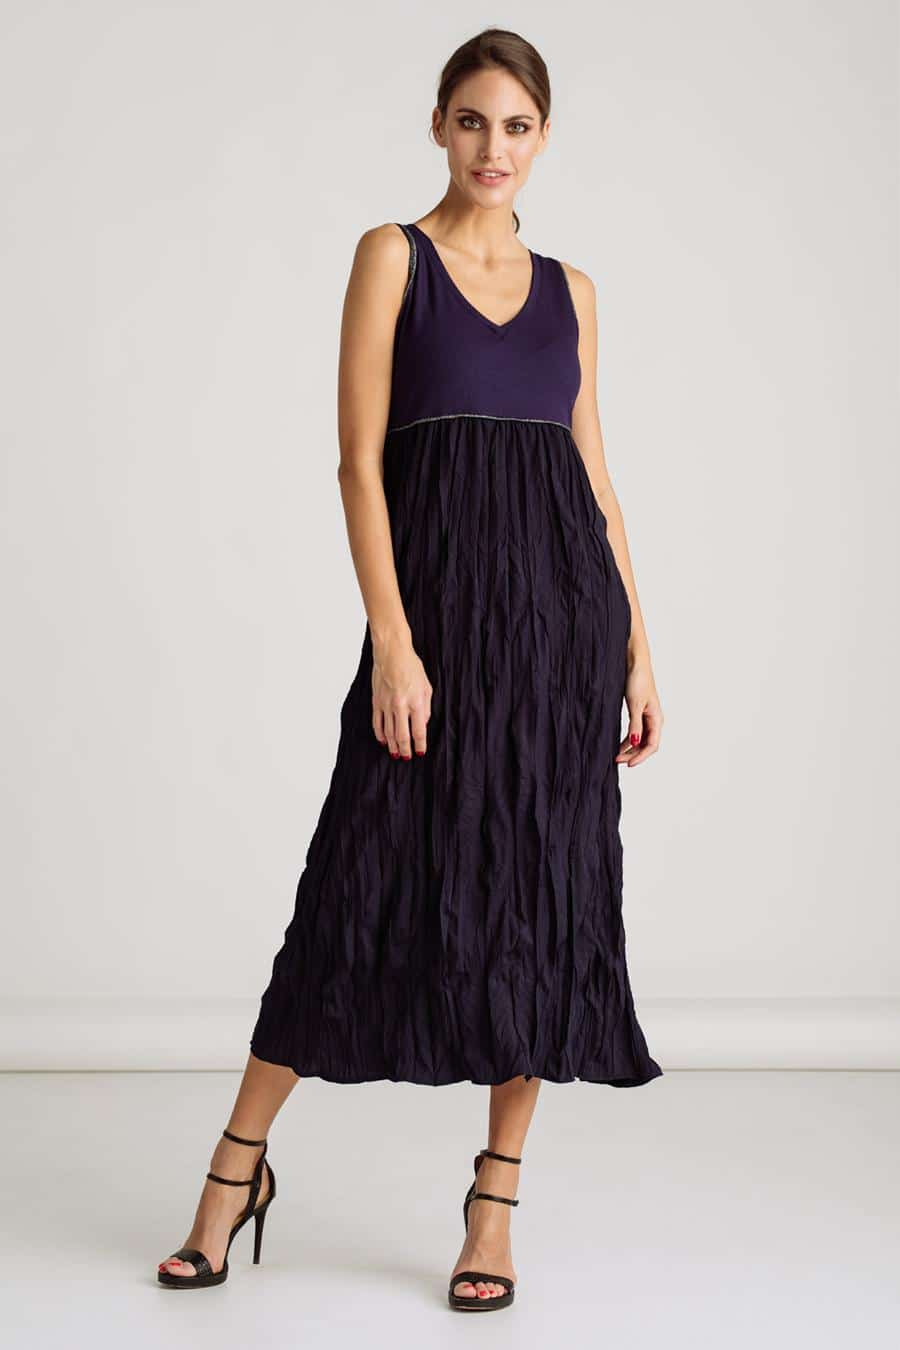 jagger zenska haljina kolekcija prolece leto 2021 ss 2021 kupi online jg 5488 03 1